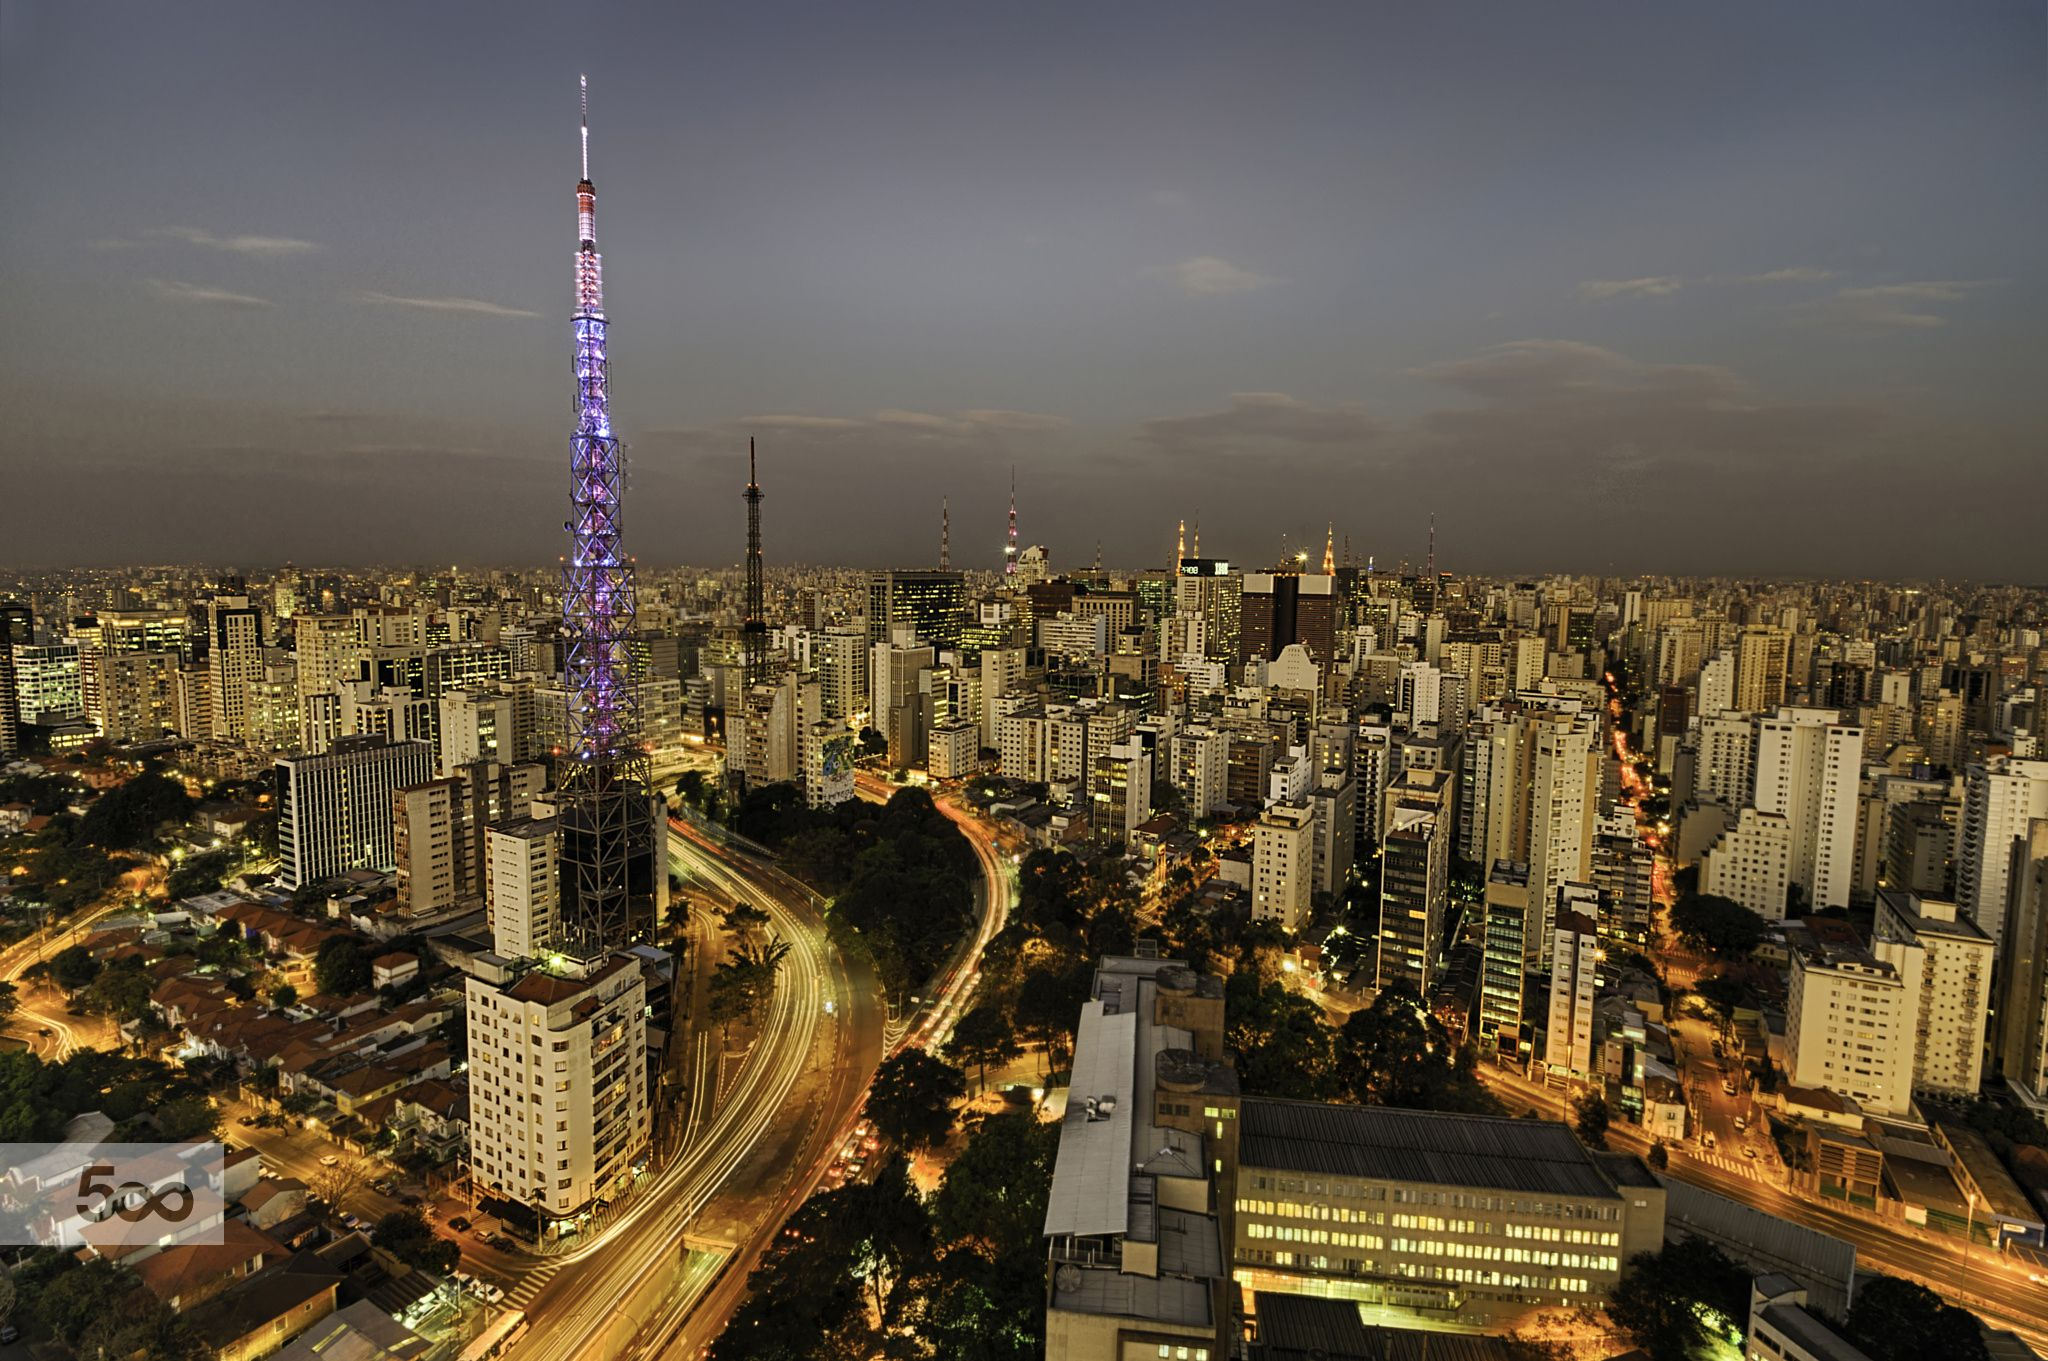 Oi São Paulo!